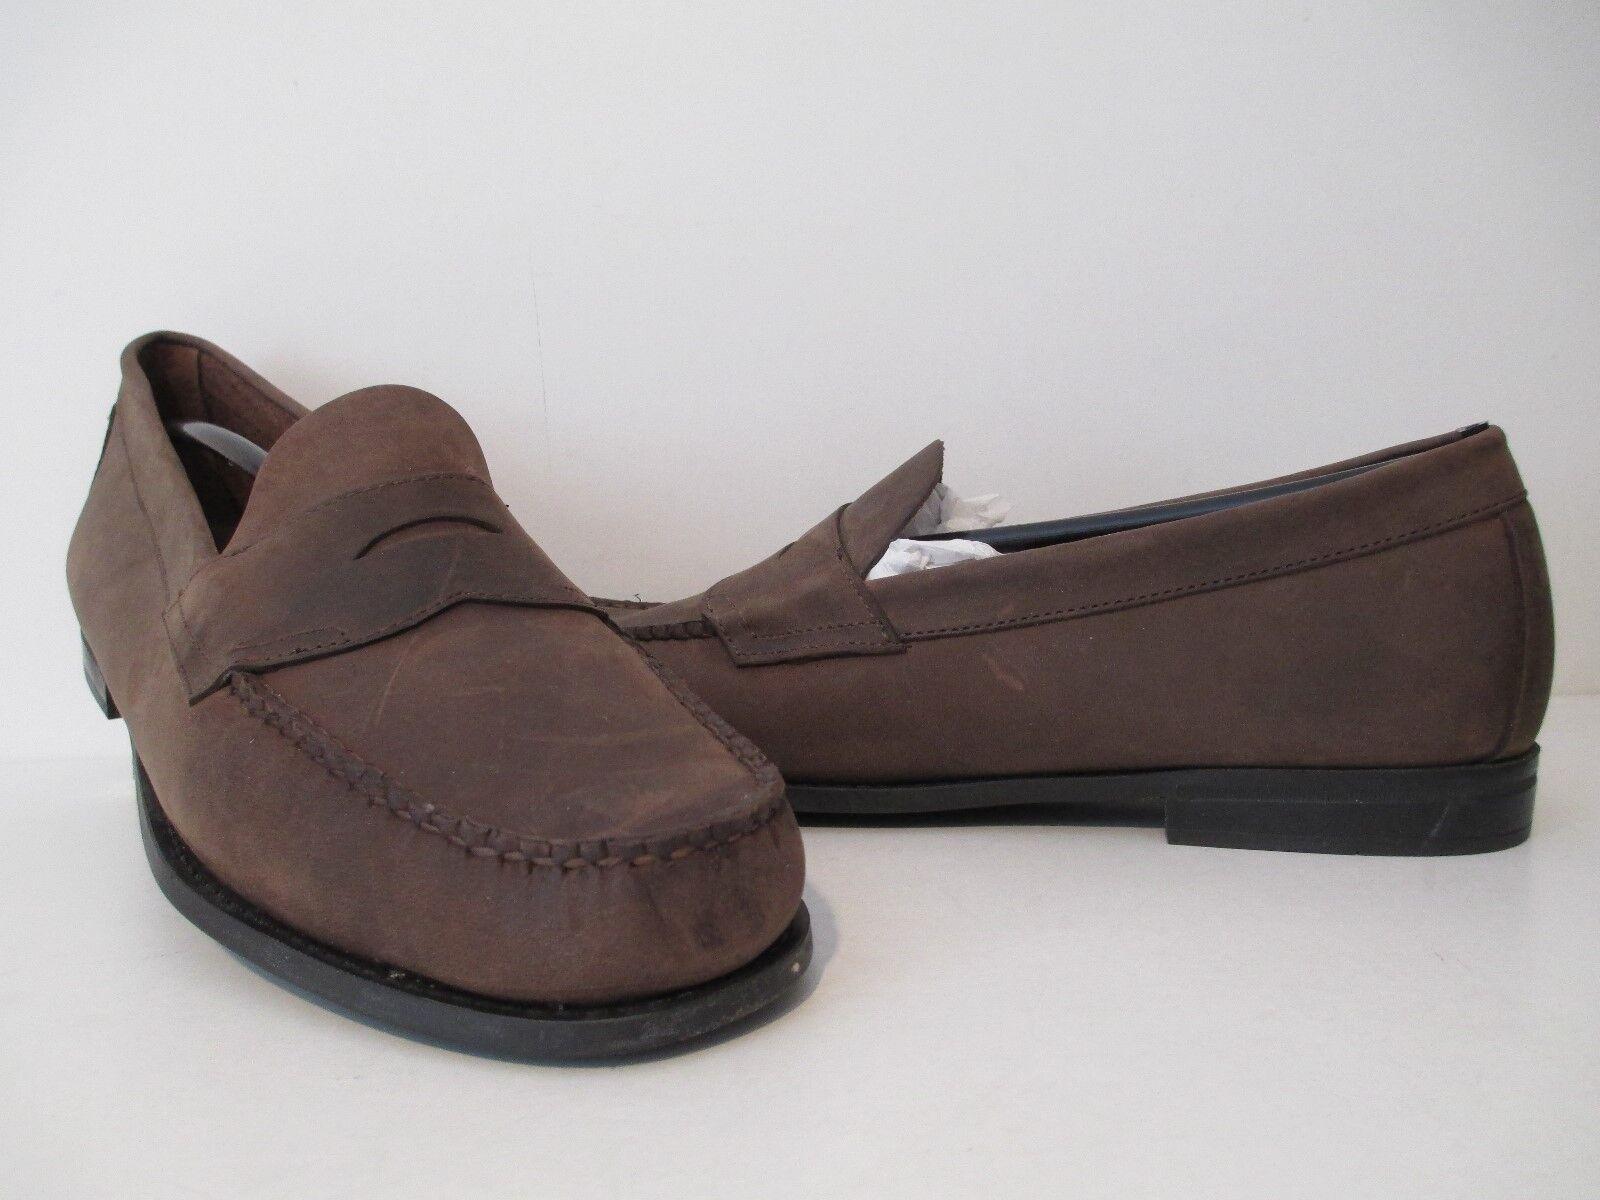 Bass Mens Casson Leather Slip On Penny Loafer Dress schuhe Dark braun Größe 11.5 D